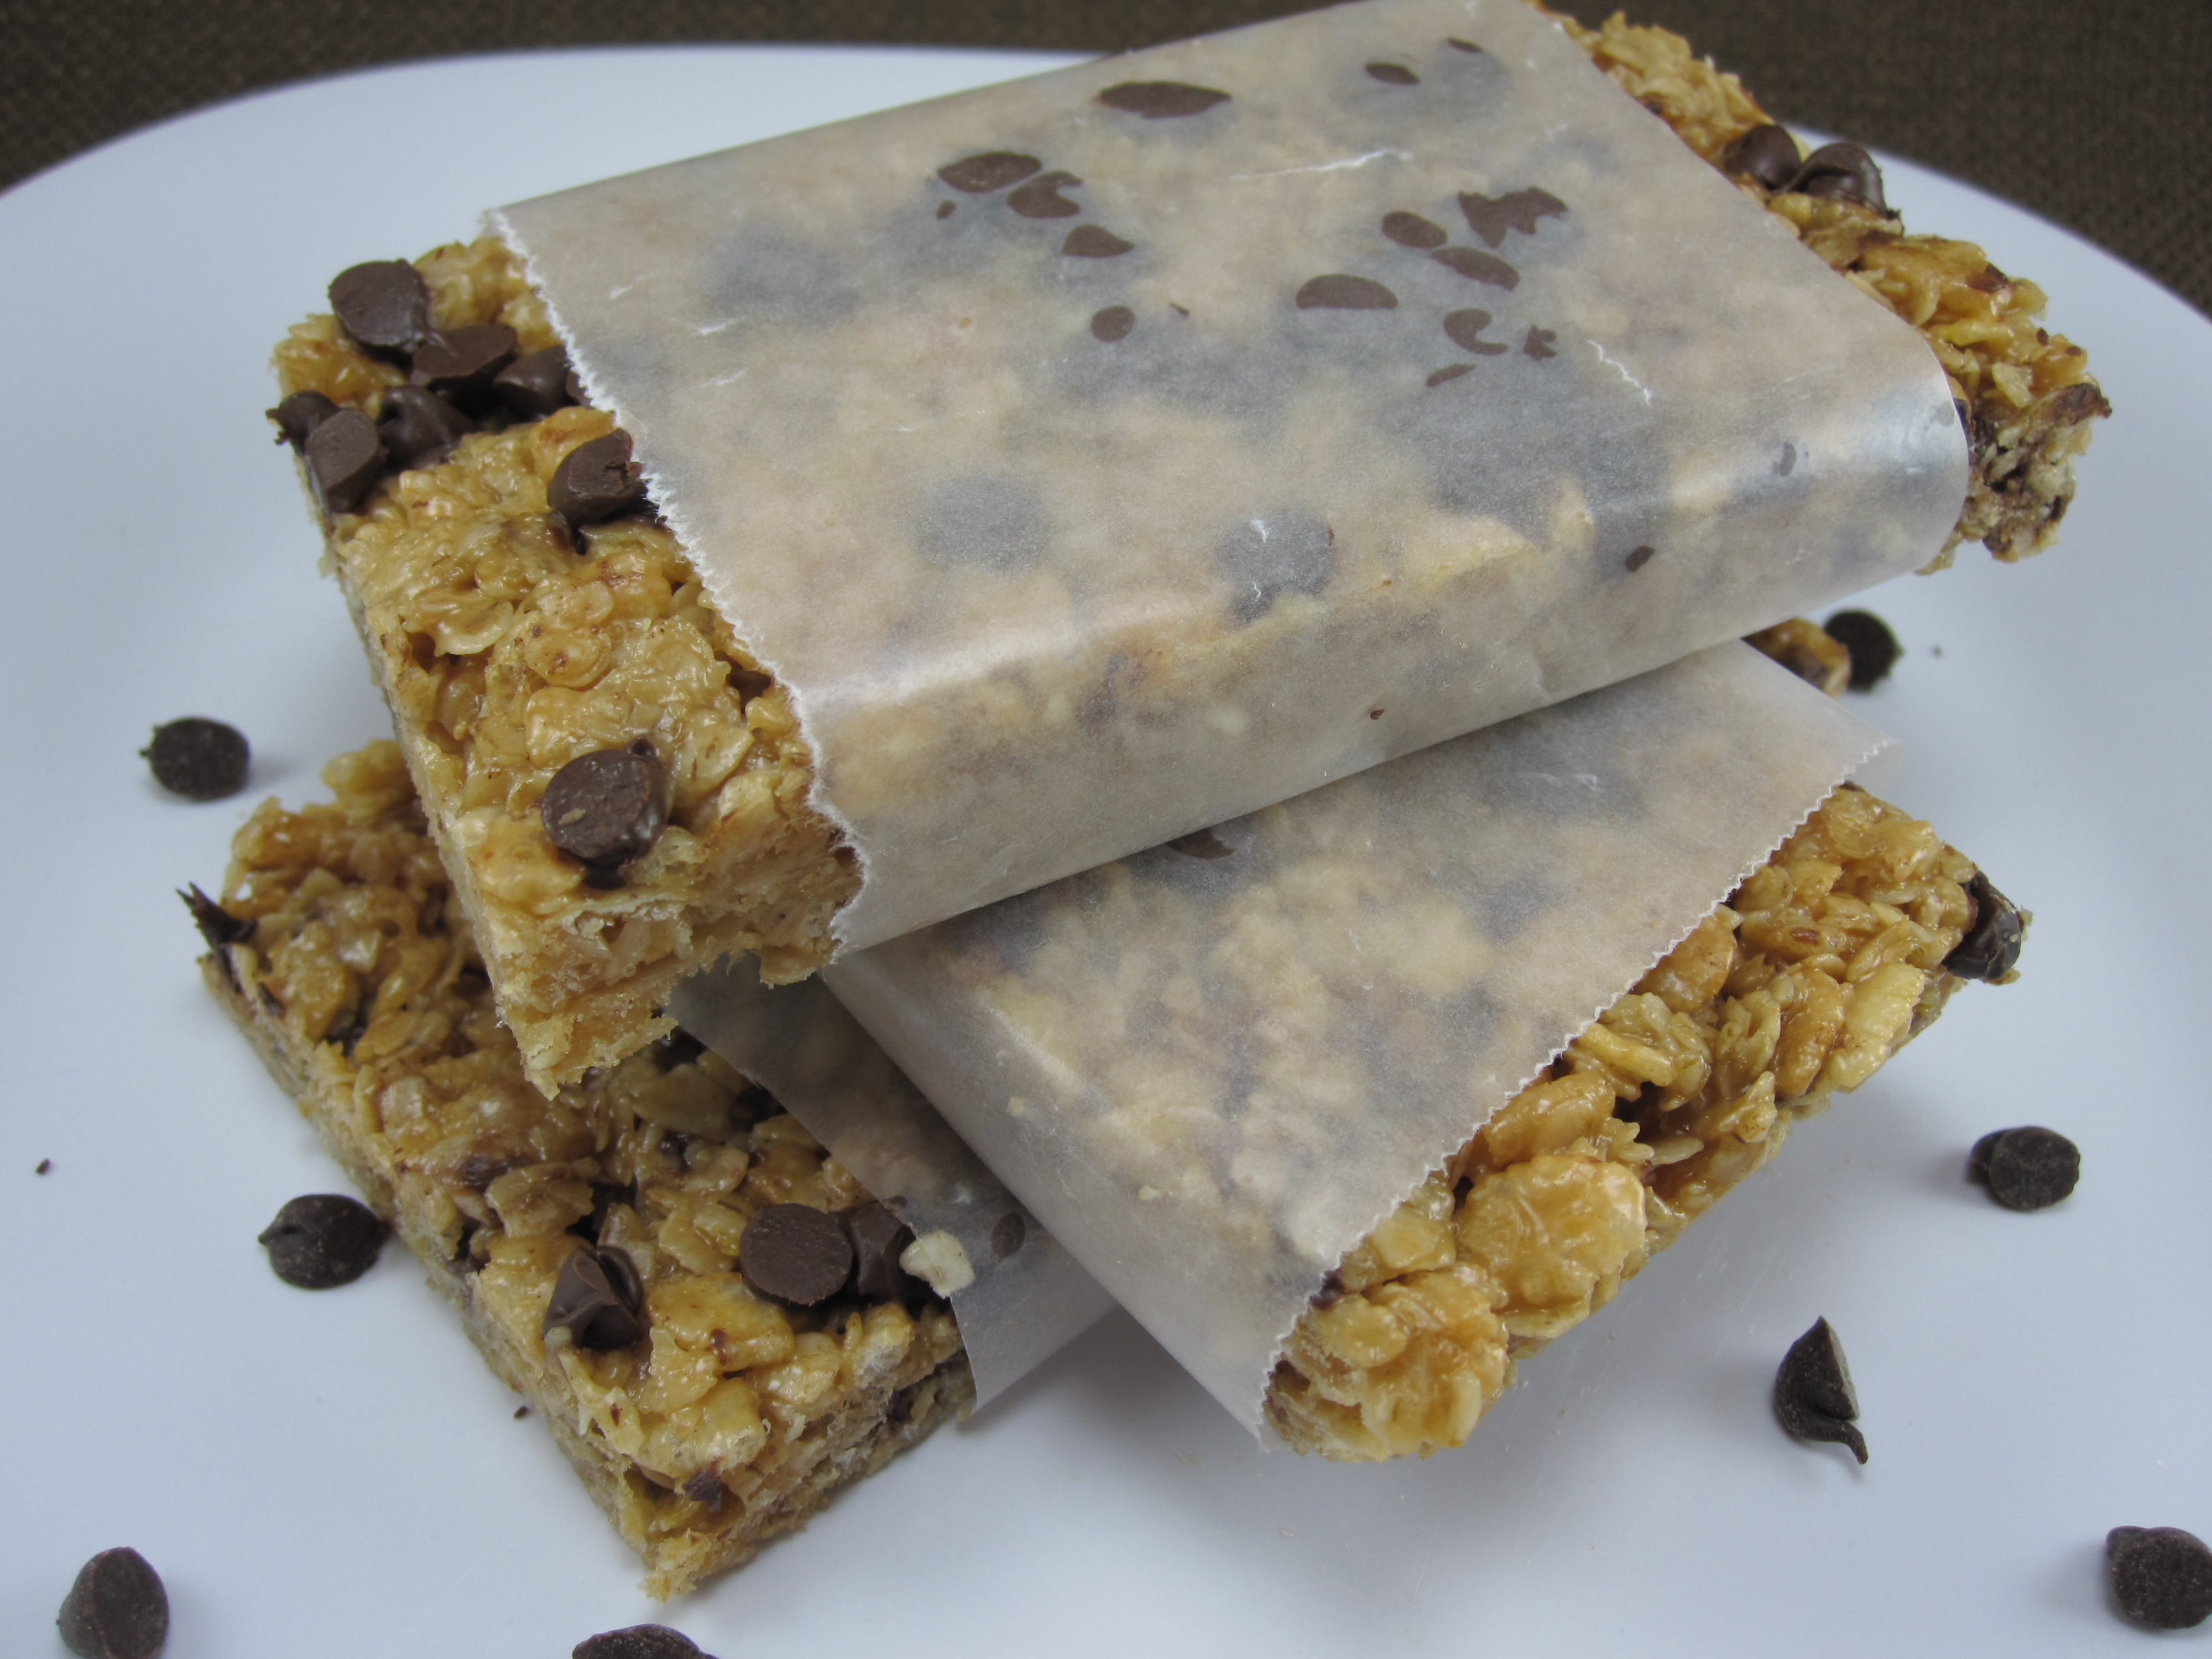 Peanut Butter Chocolate Chip No-Bake Granola Bars | Bake, Run, Live